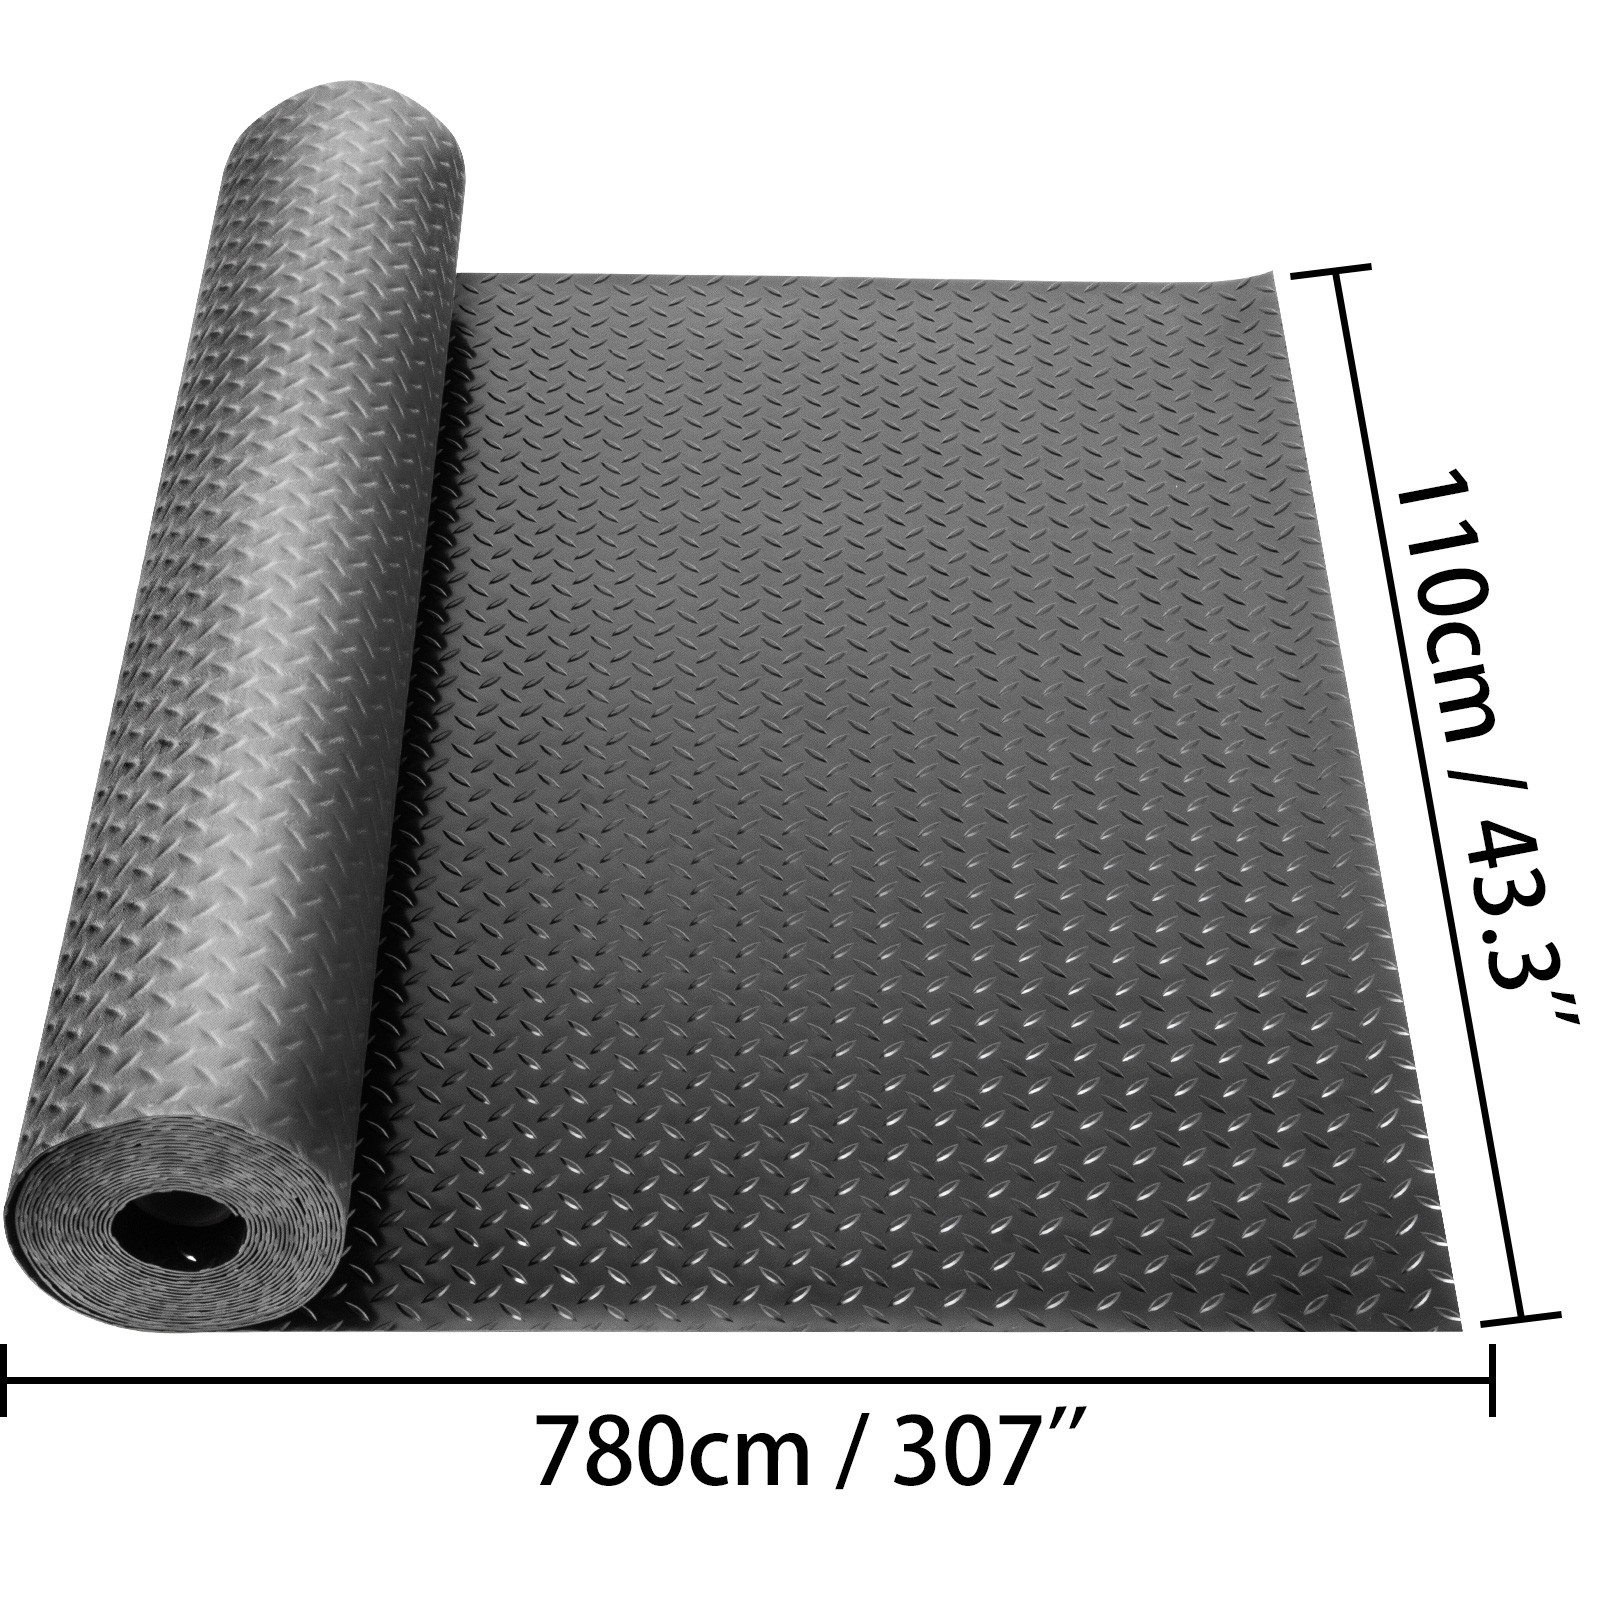 thumbnail 128 - Garage Flooring Mat Roll Car Trailer Floor Covering 1.1m Width Gym Floor Roll